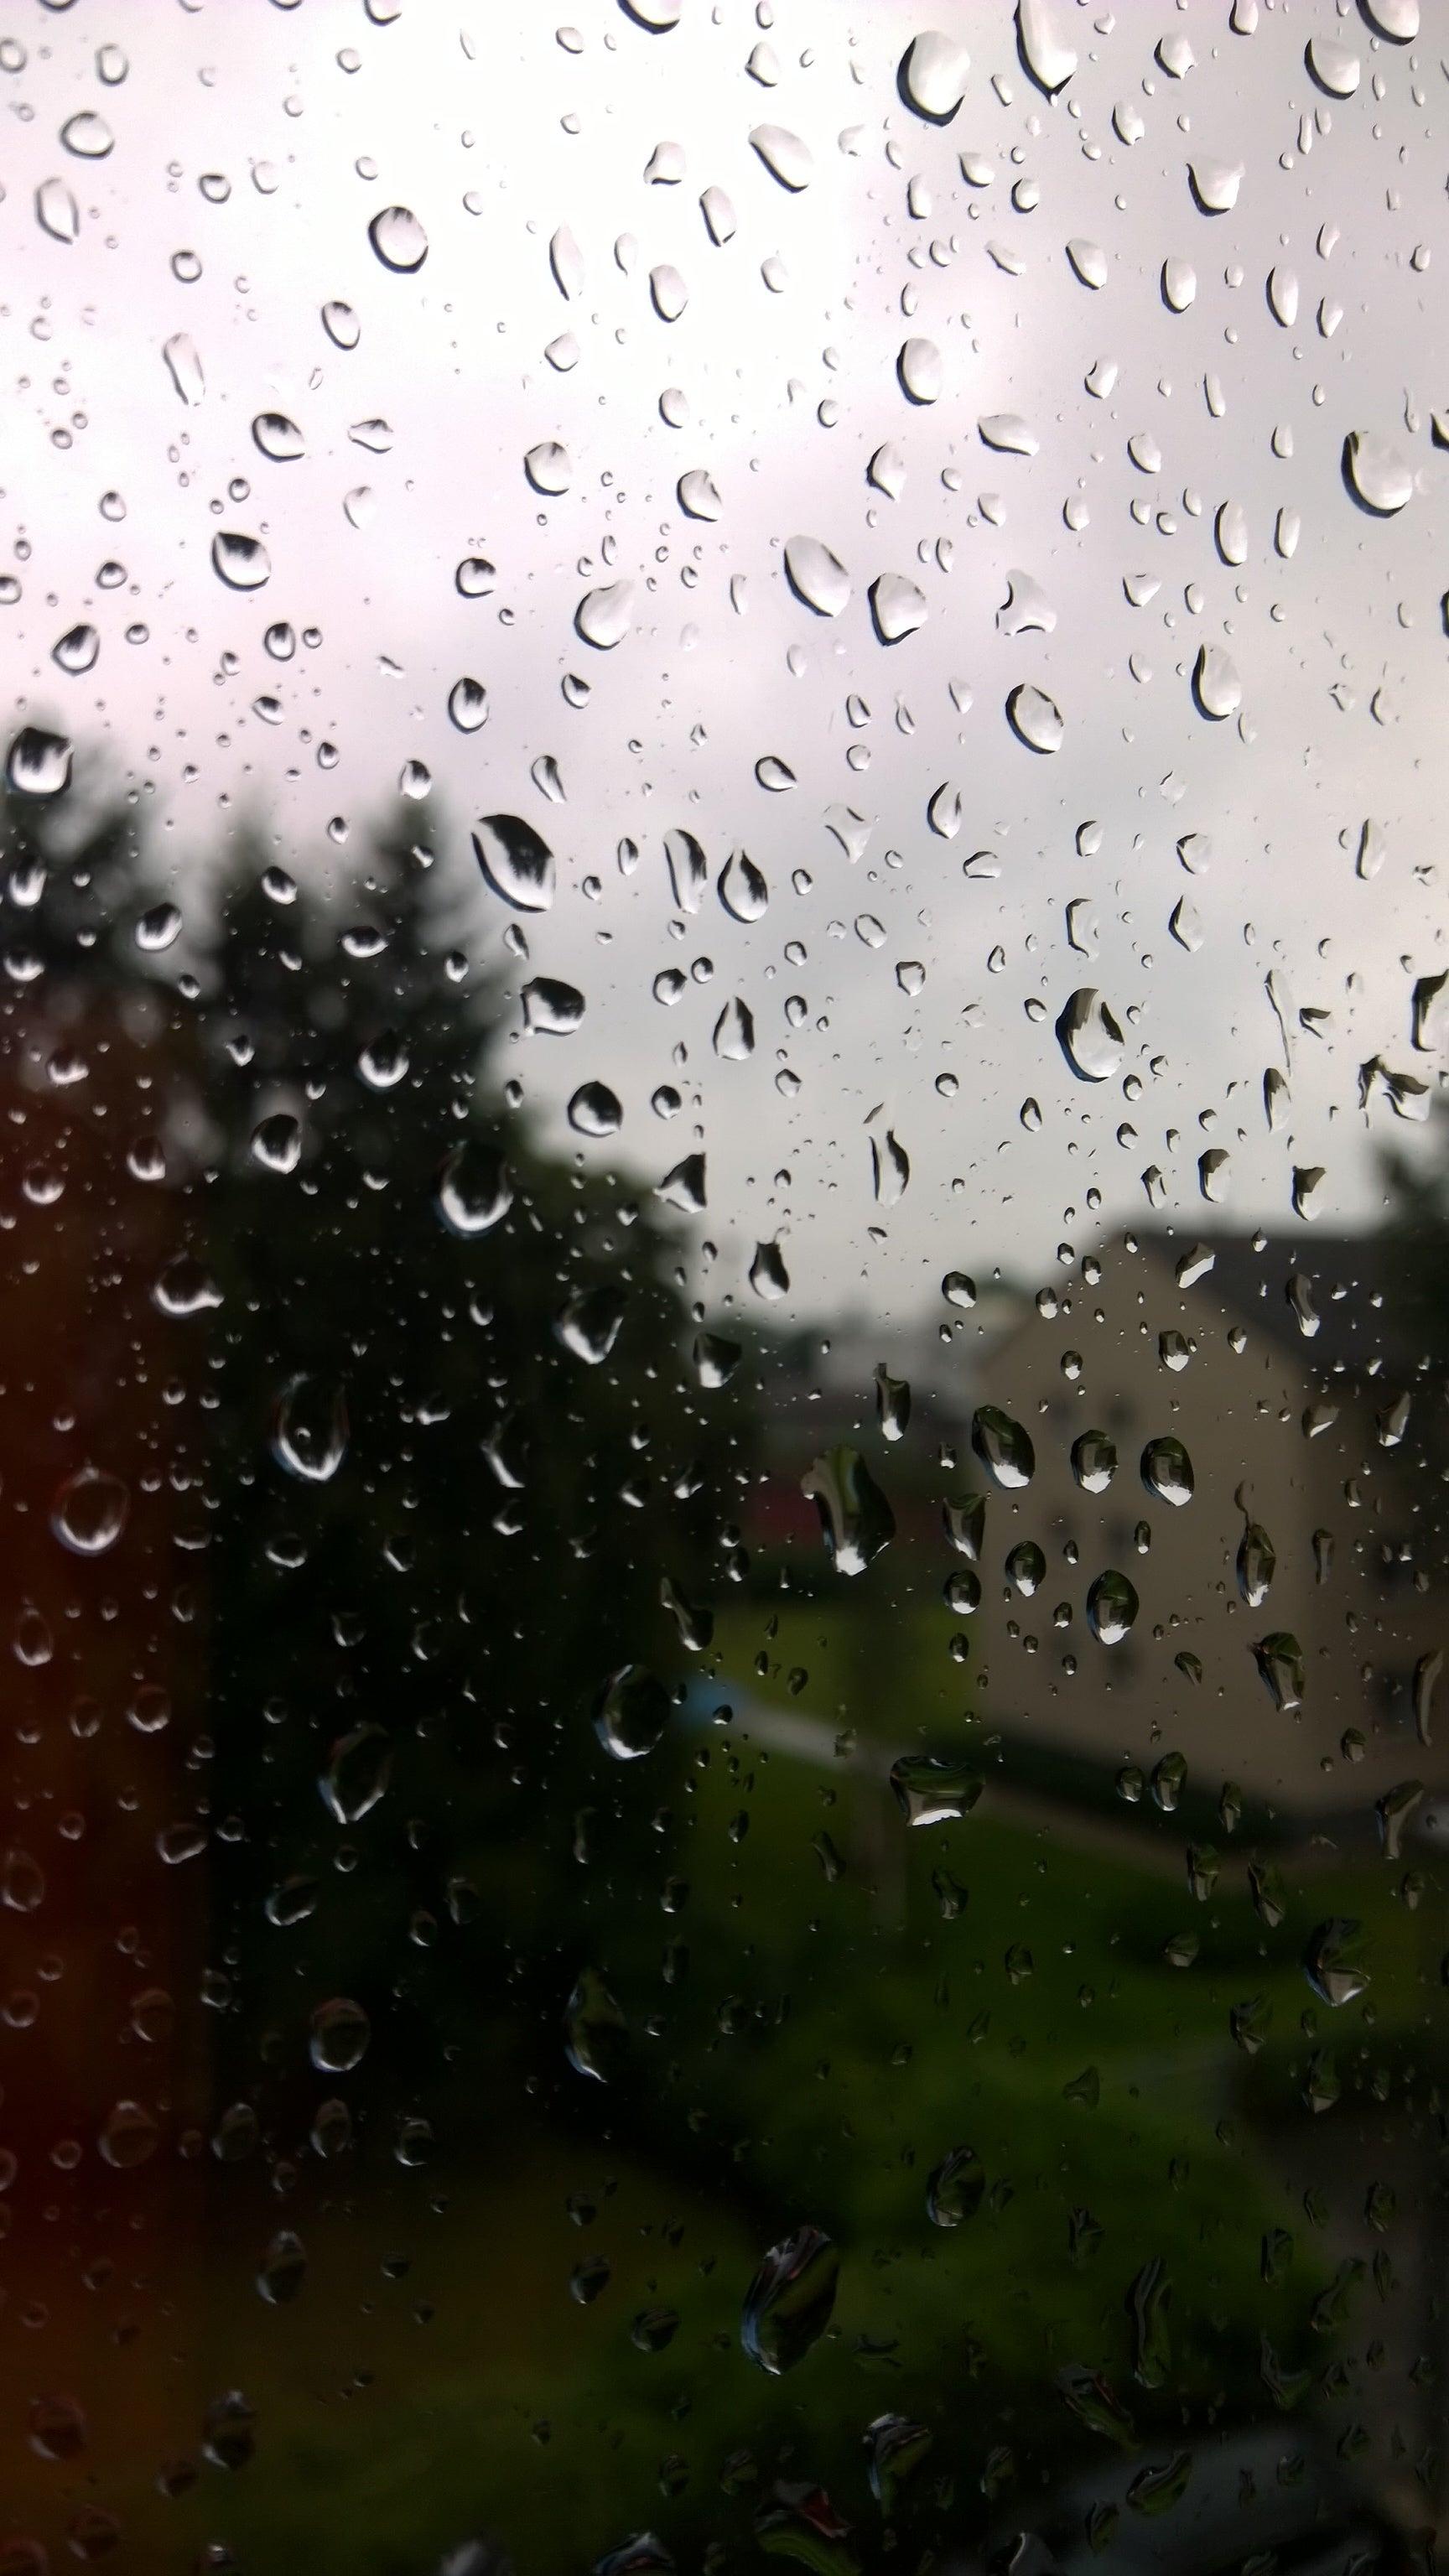 Nokia Lumia 930 Kamera Foto volle Auflösung